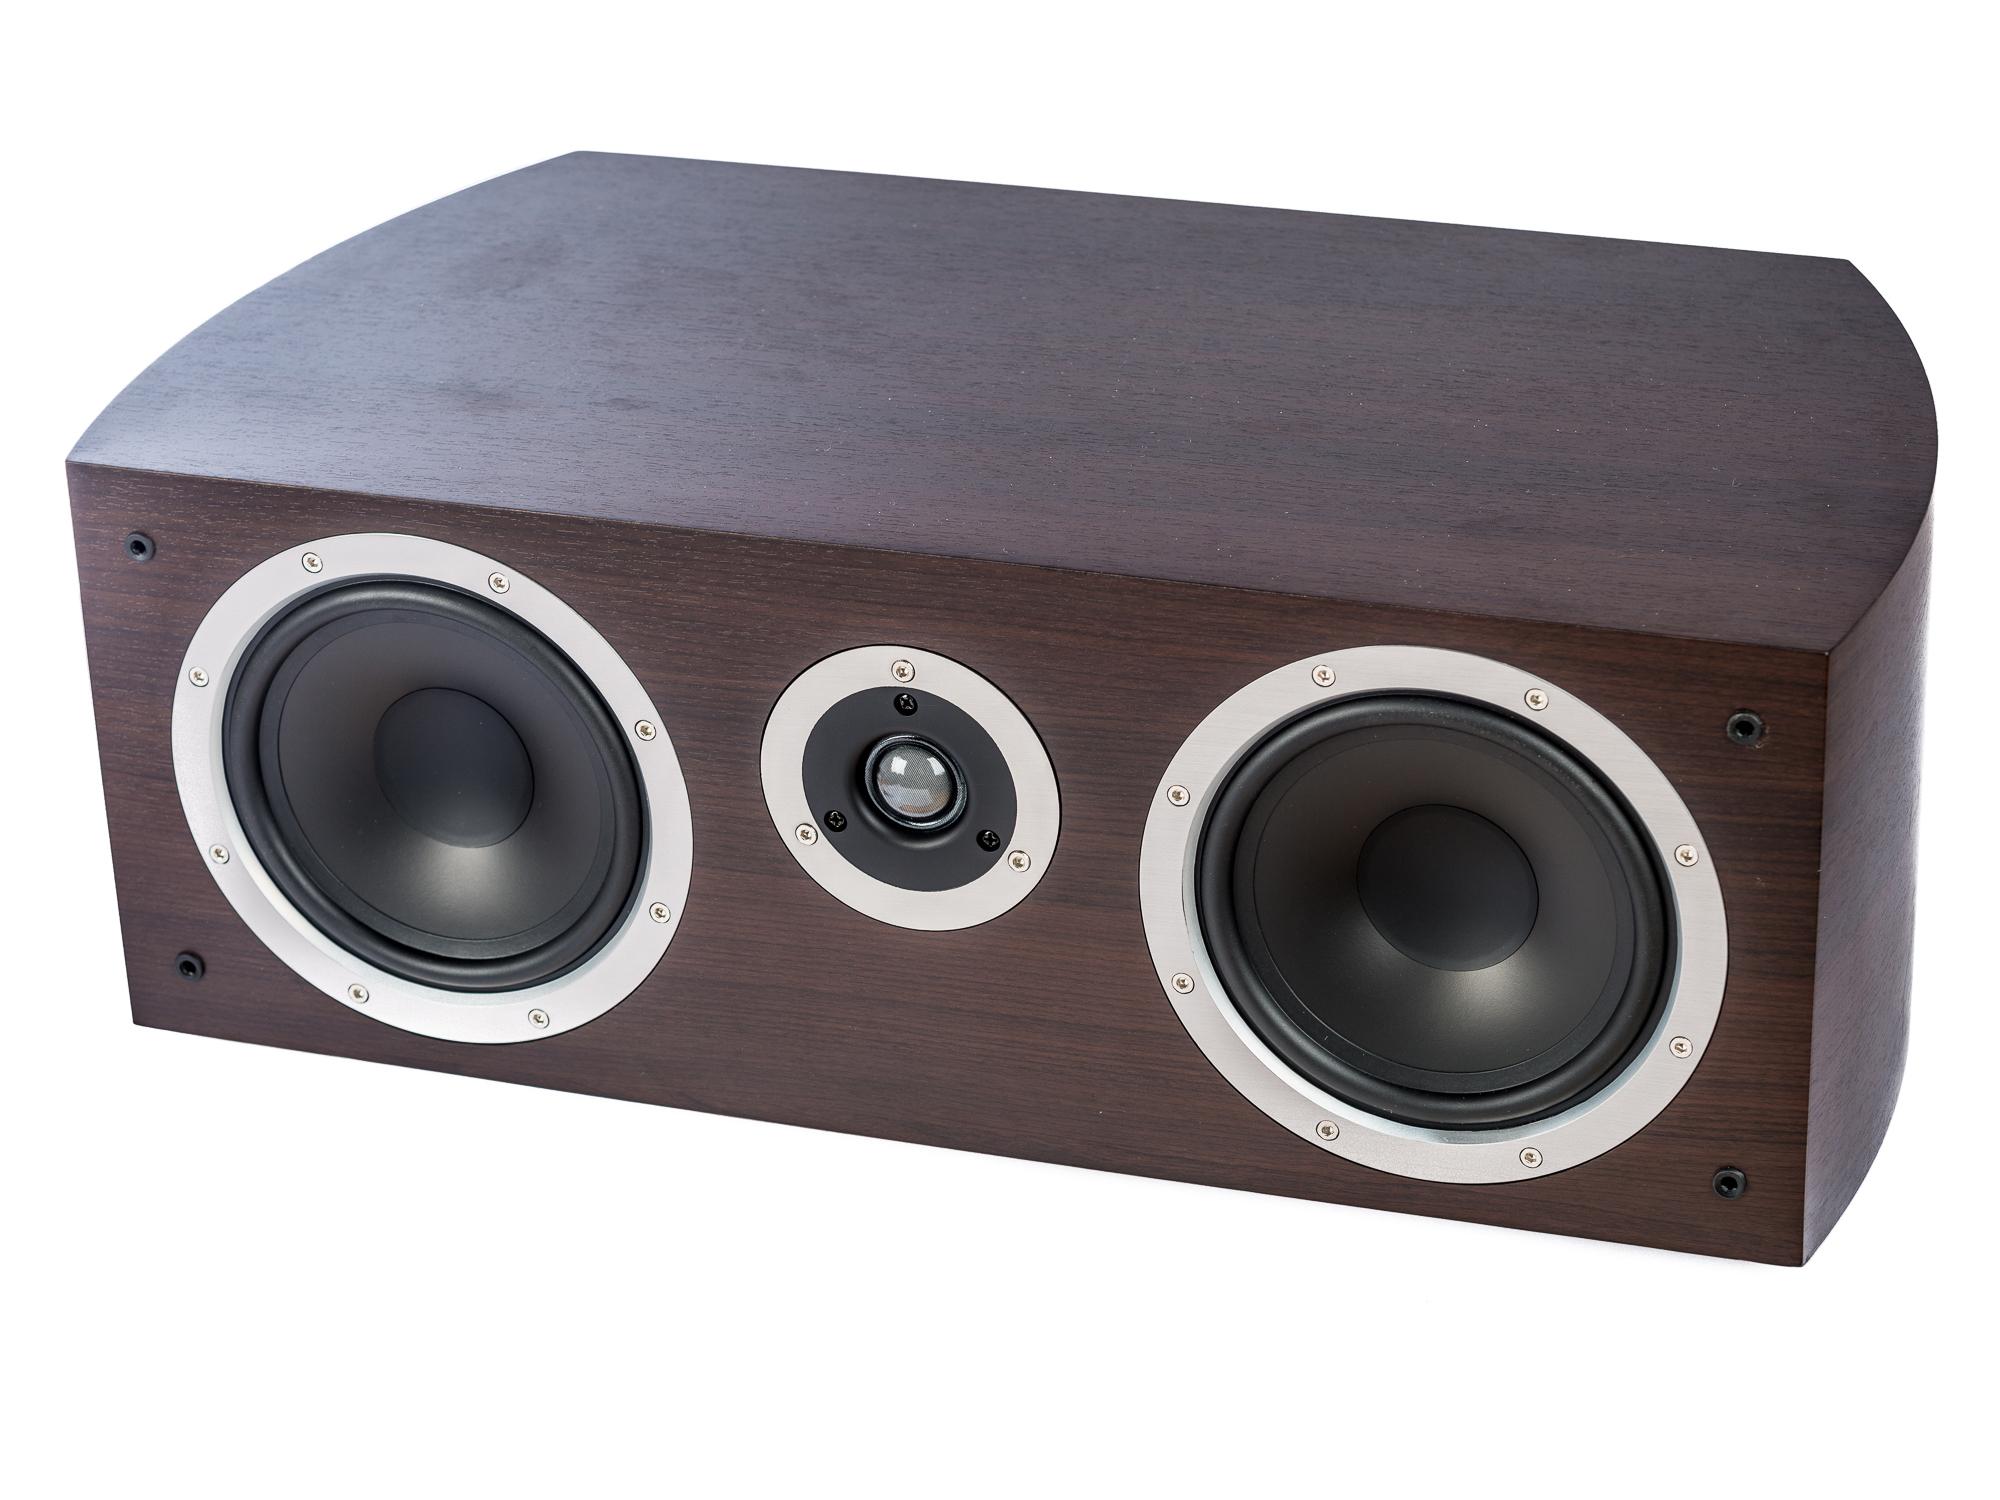 pg audio universeller xl center lautsprecher 2 wege bassreflex mocca neu ware ebay. Black Bedroom Furniture Sets. Home Design Ideas